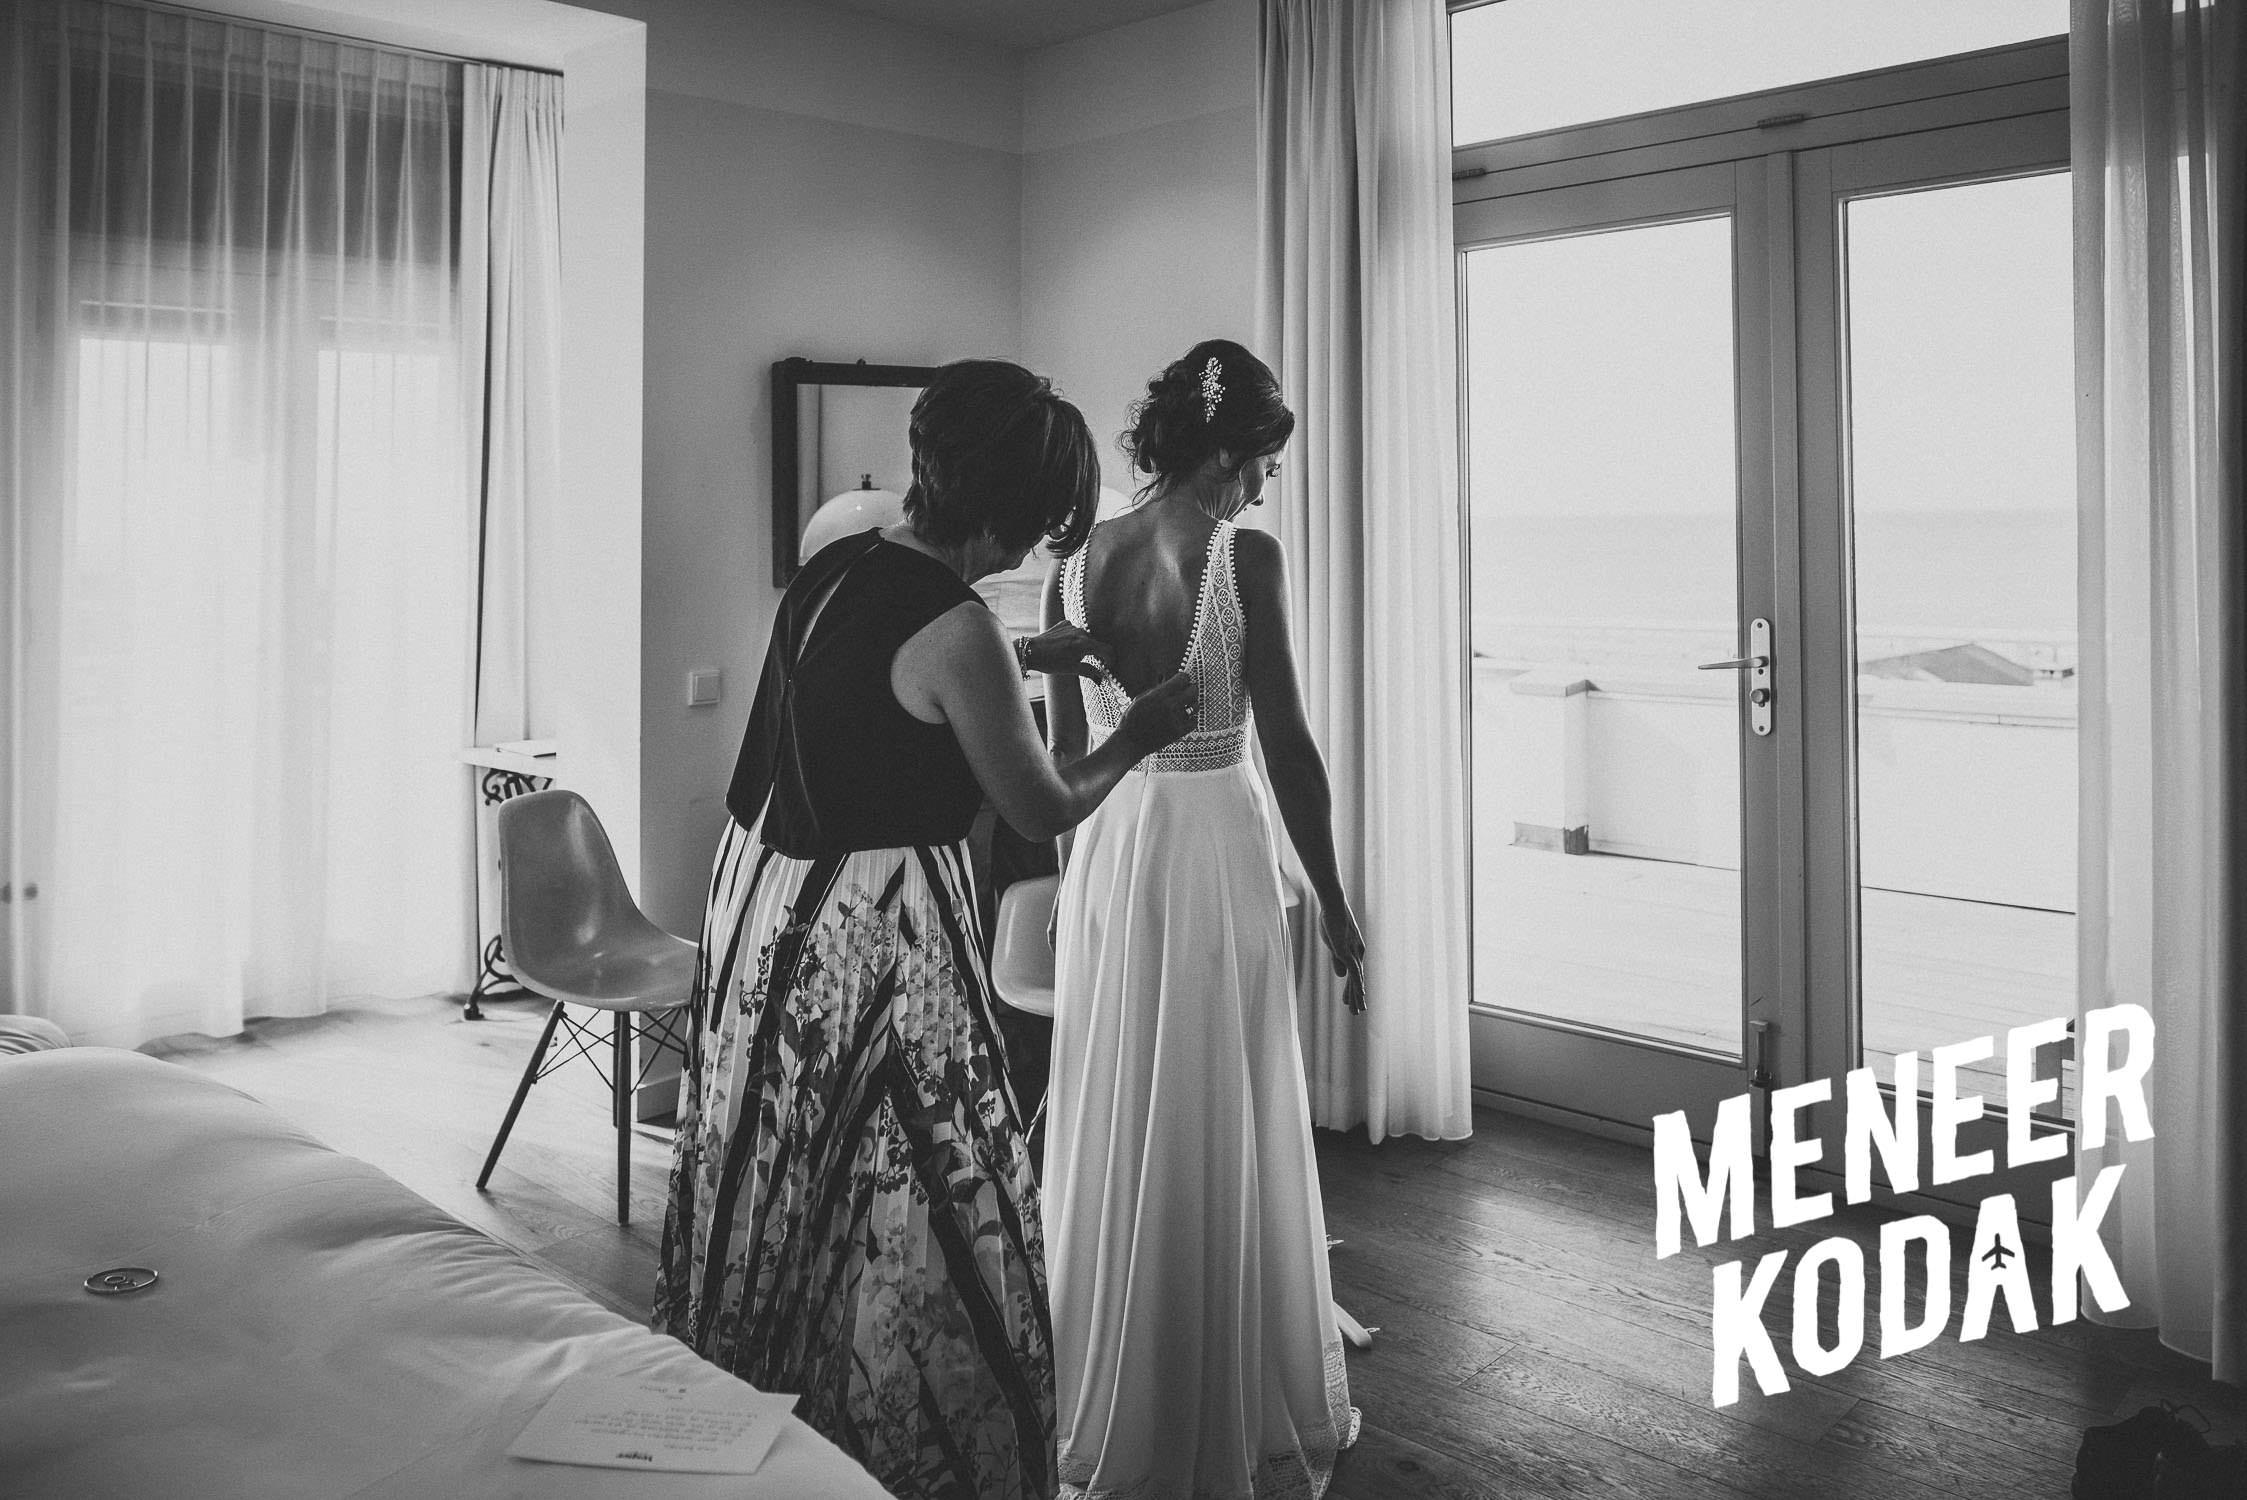 Meneer Kodak - Strandbruiloft - Noordwijk - K&A-064.jpg